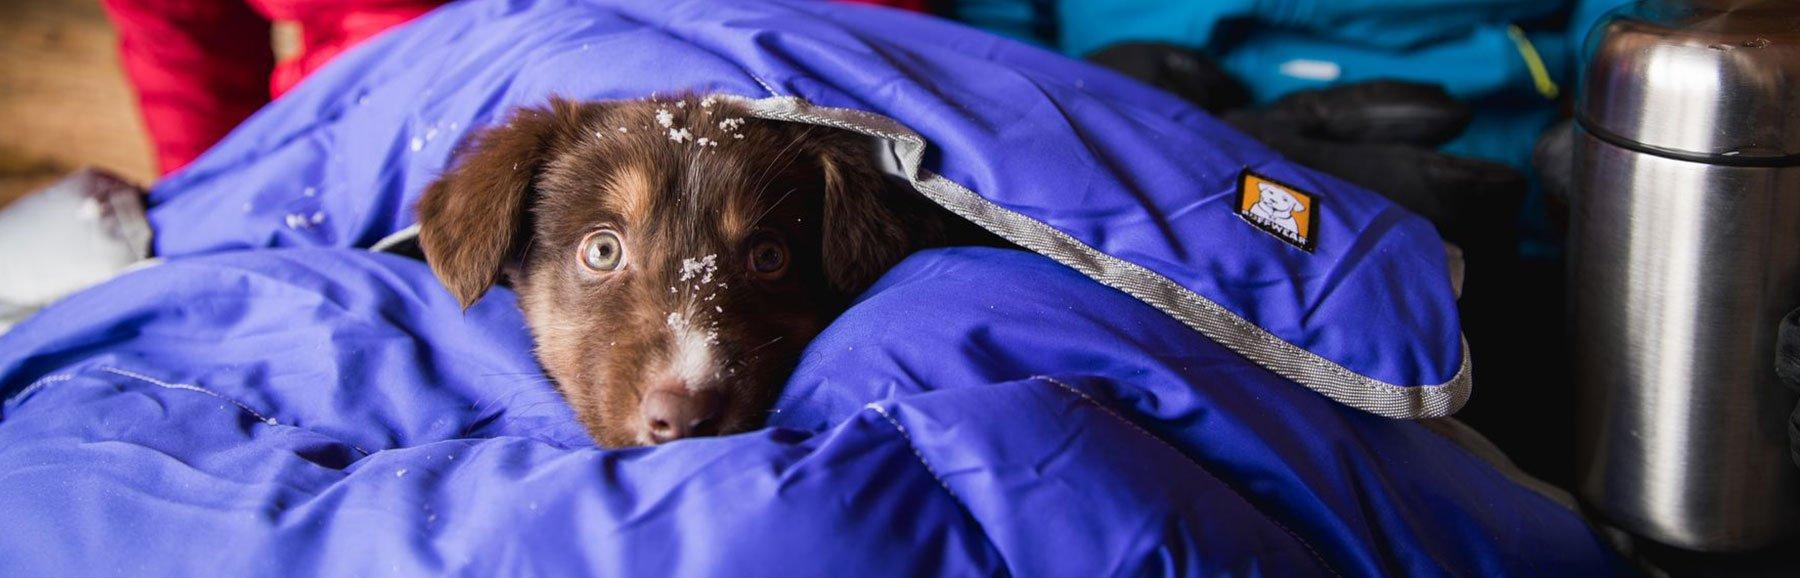 Ruffwear Hundebetten und Hundematten